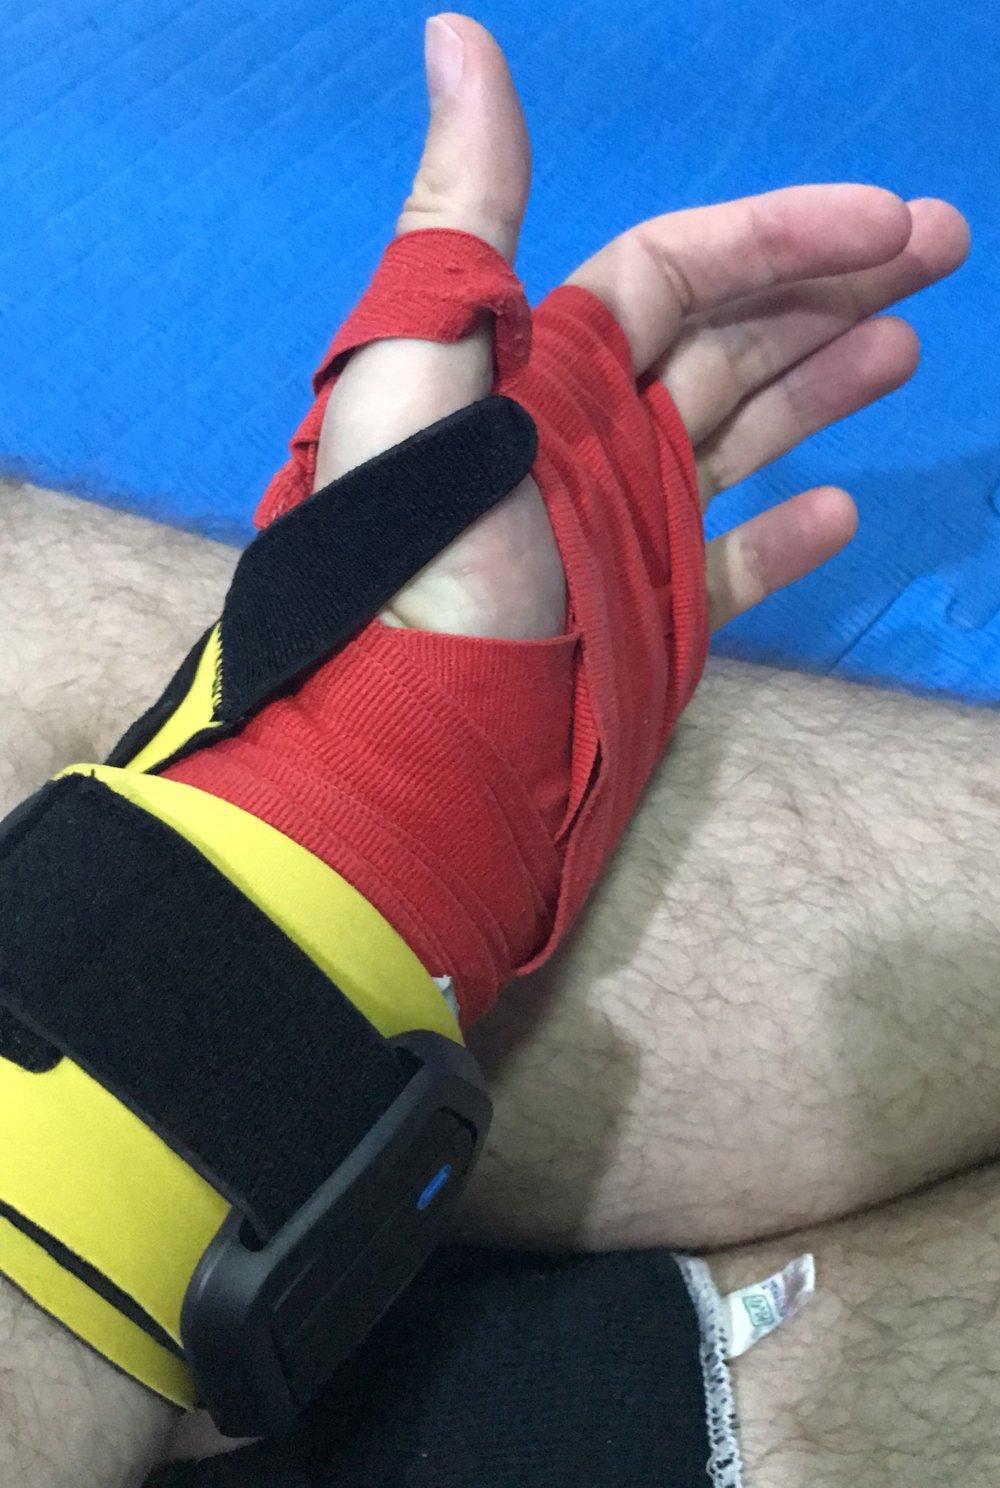 EverlastandPIQ-worn-on-wrist.JPG